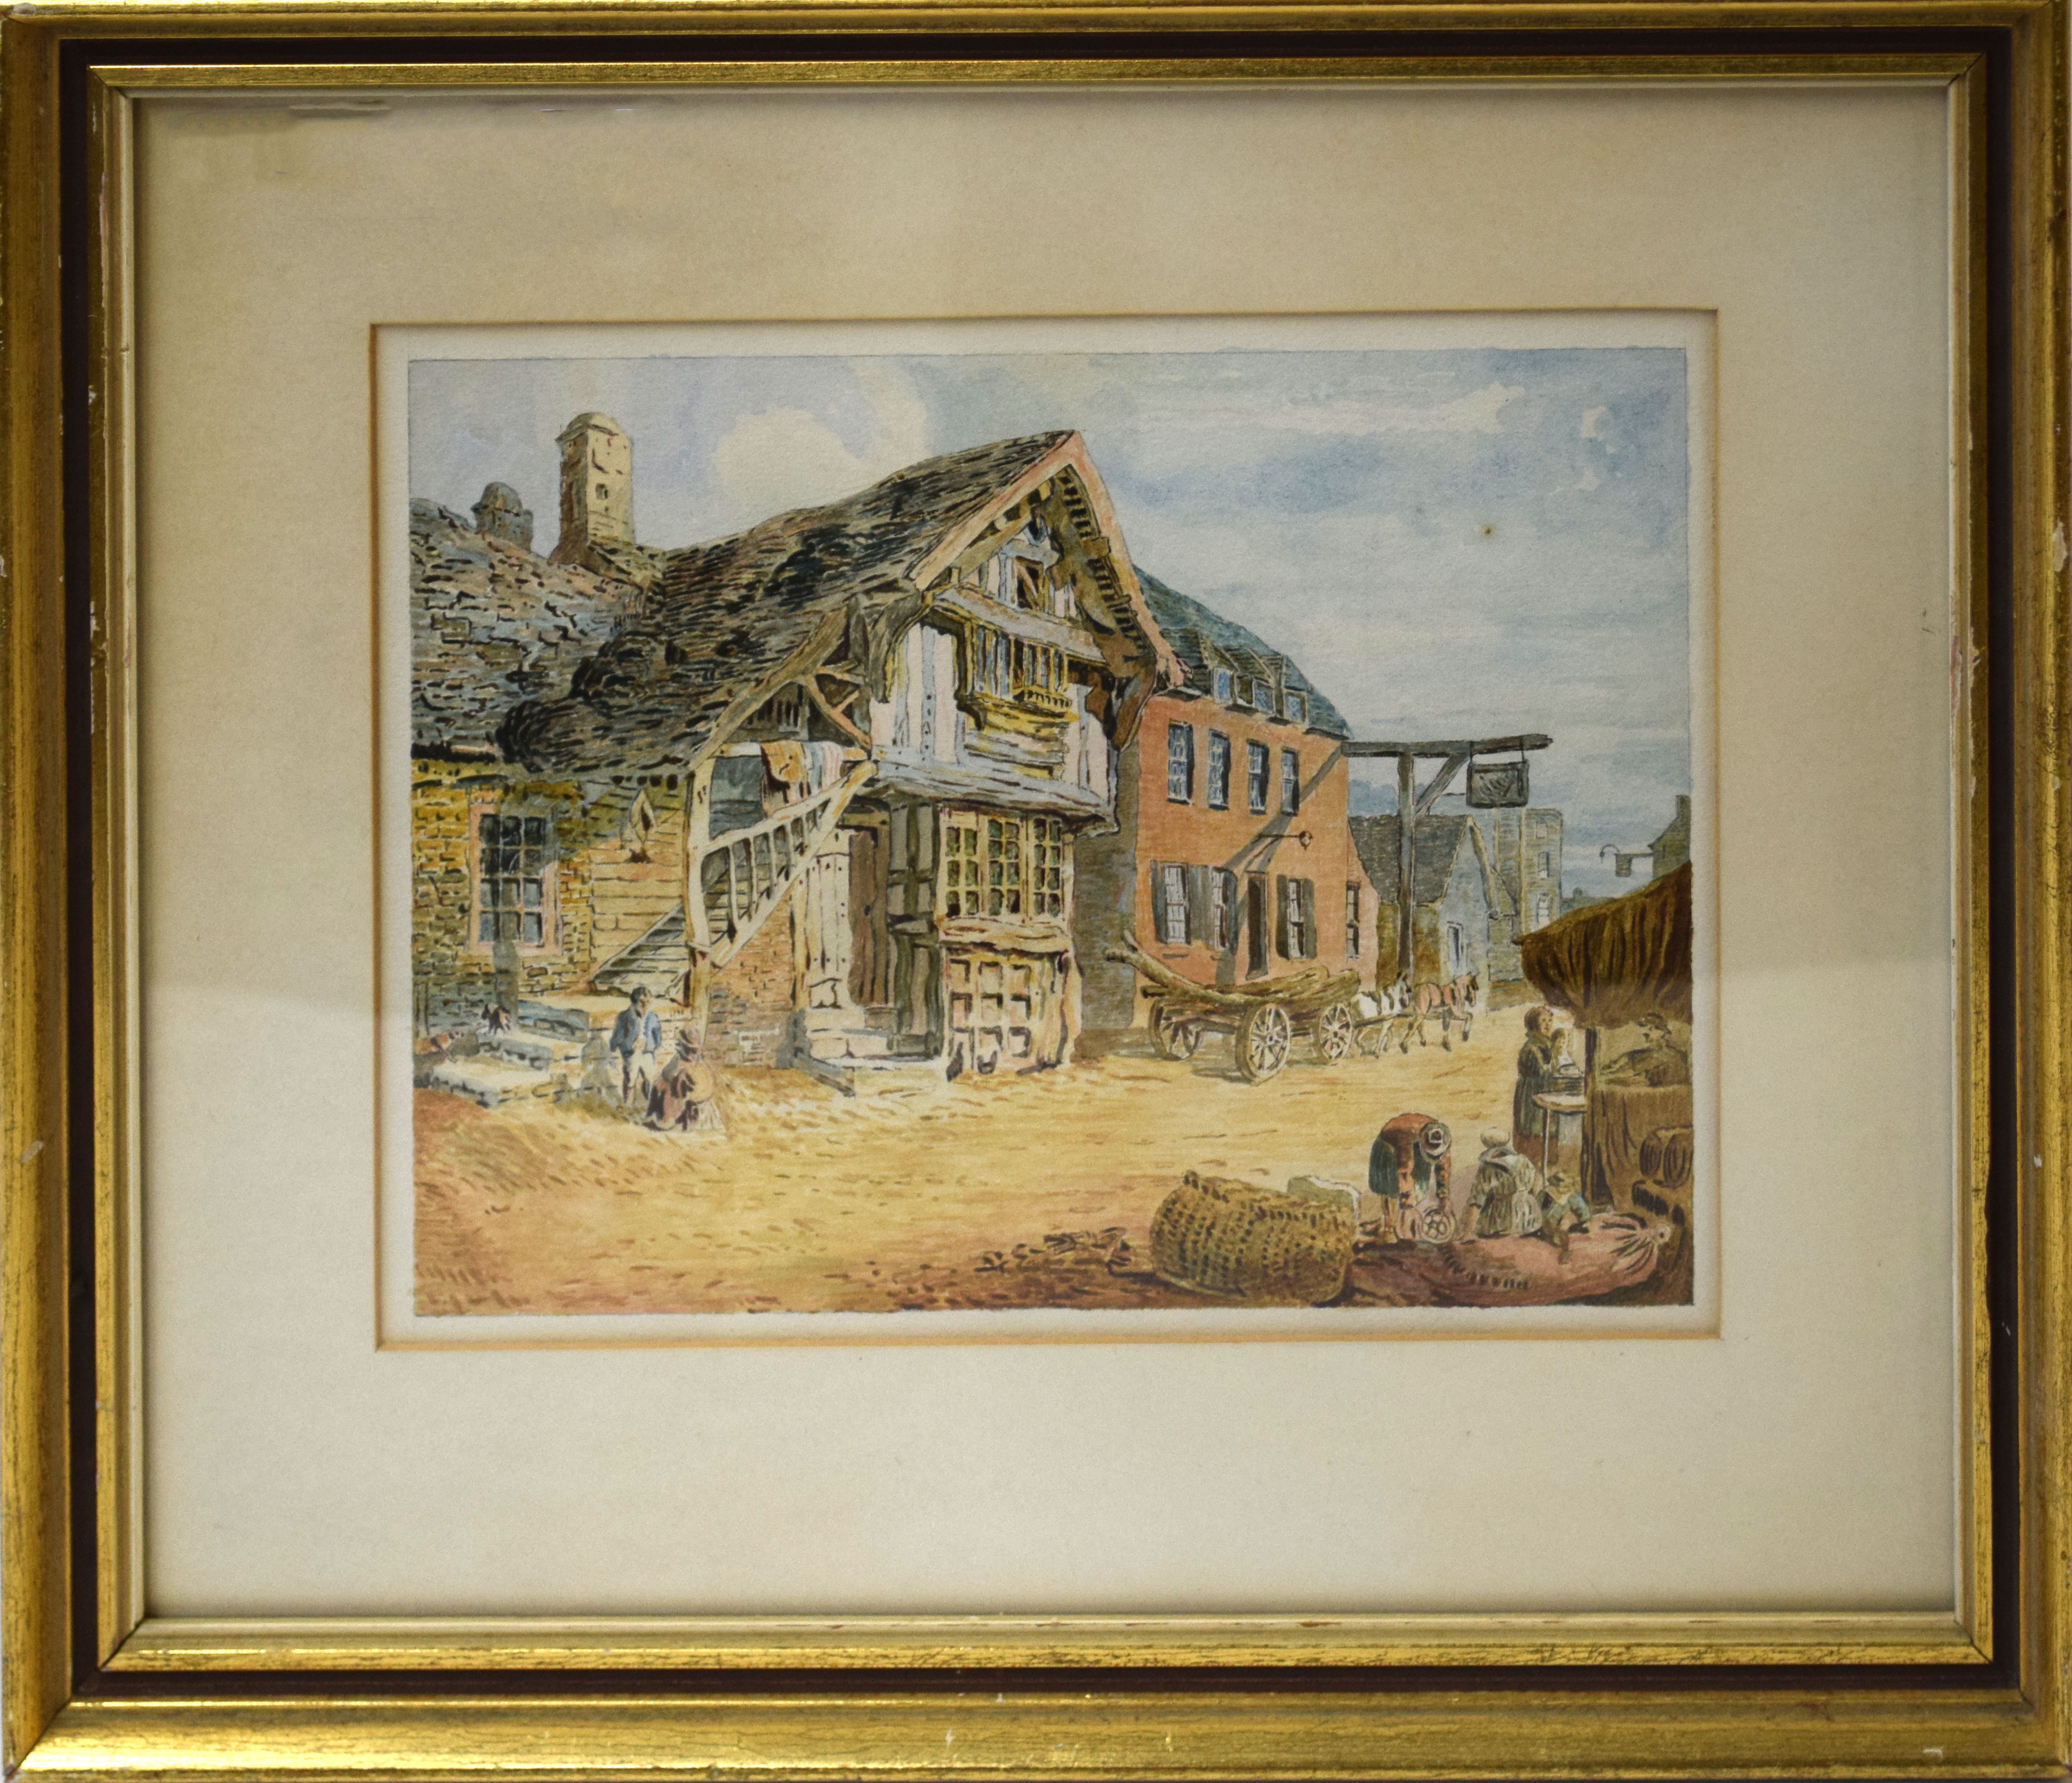 English School (19th century), Street scene, watercolour, 16 x 23cm